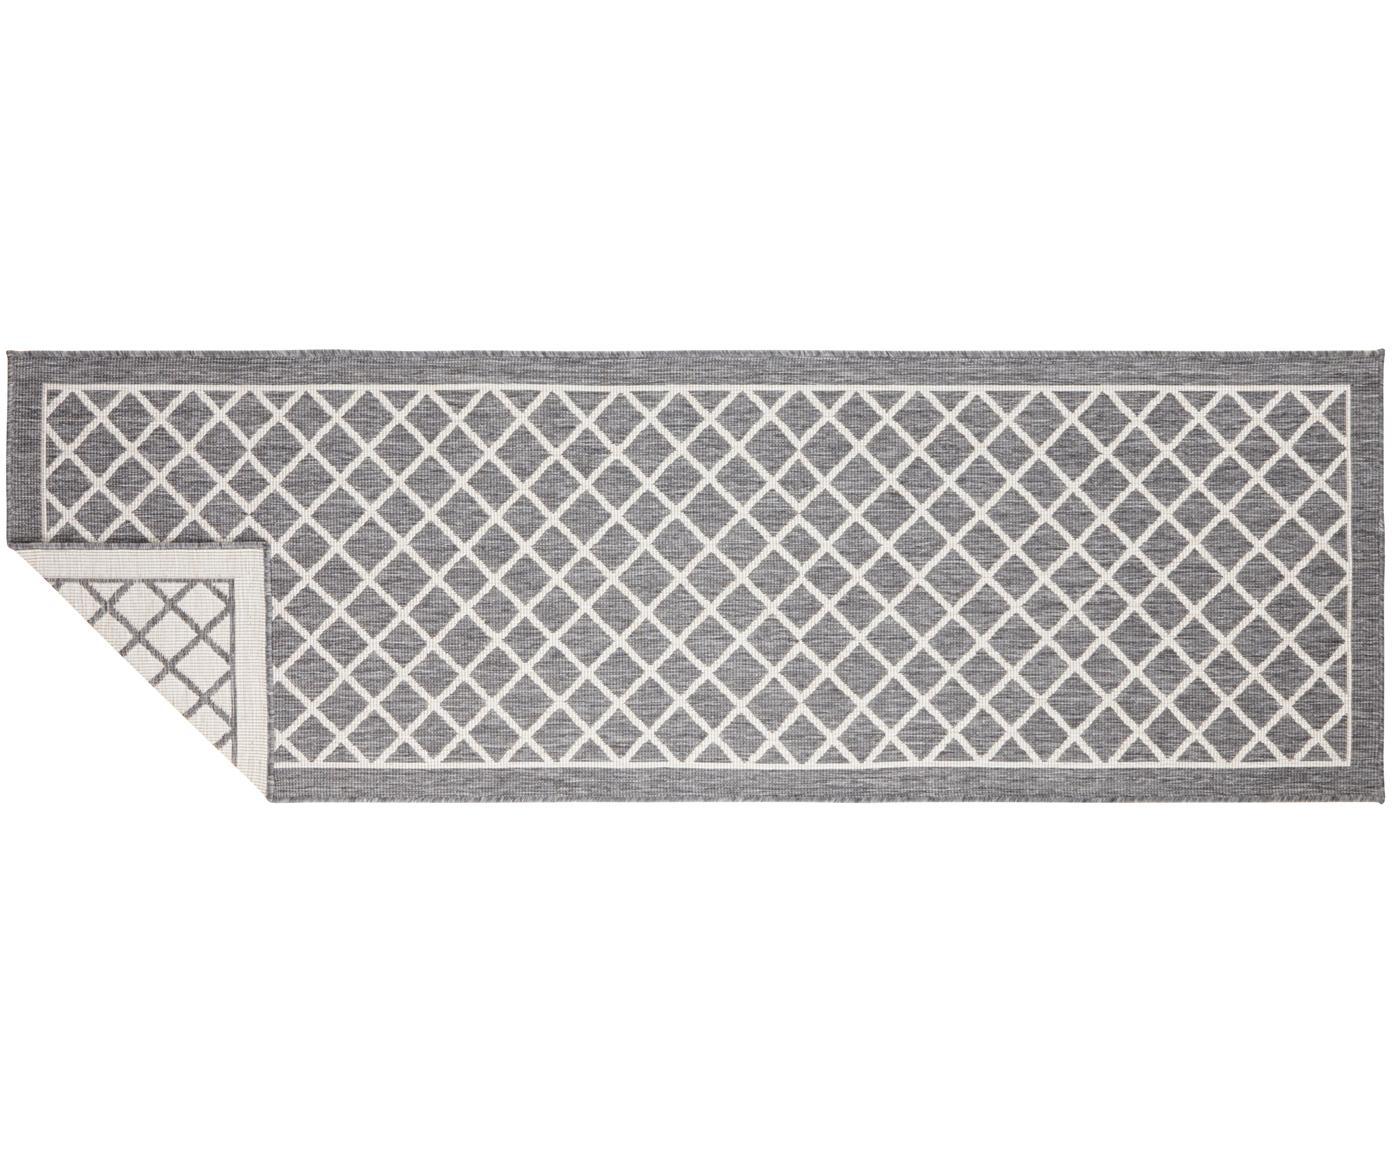 Alfombra de interior/exterior Sydney, caras distintas, Gris, crema, An 80 x L 250 cm